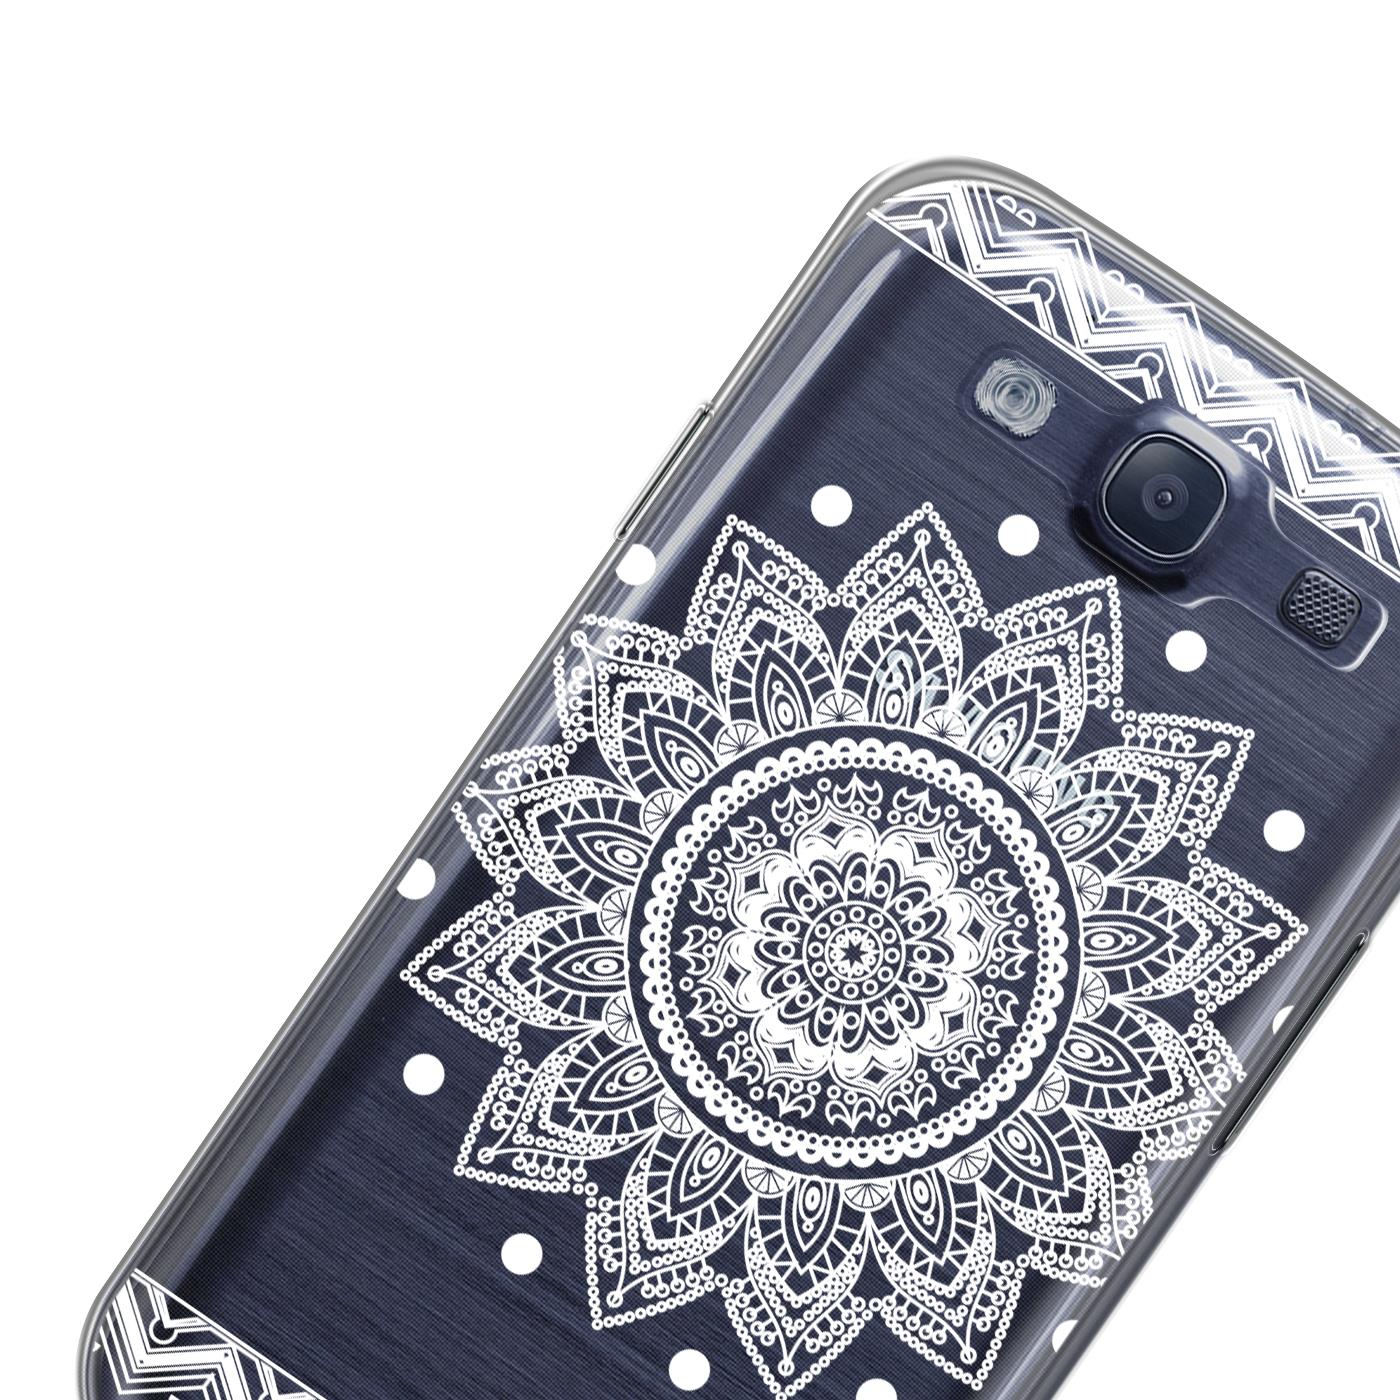 Samsung-Galaxy-S3-Neo-Handy-Schutz-Huelle-Case-TPU-Silikon-Cover-Tasche-Mandala Indexbild 12